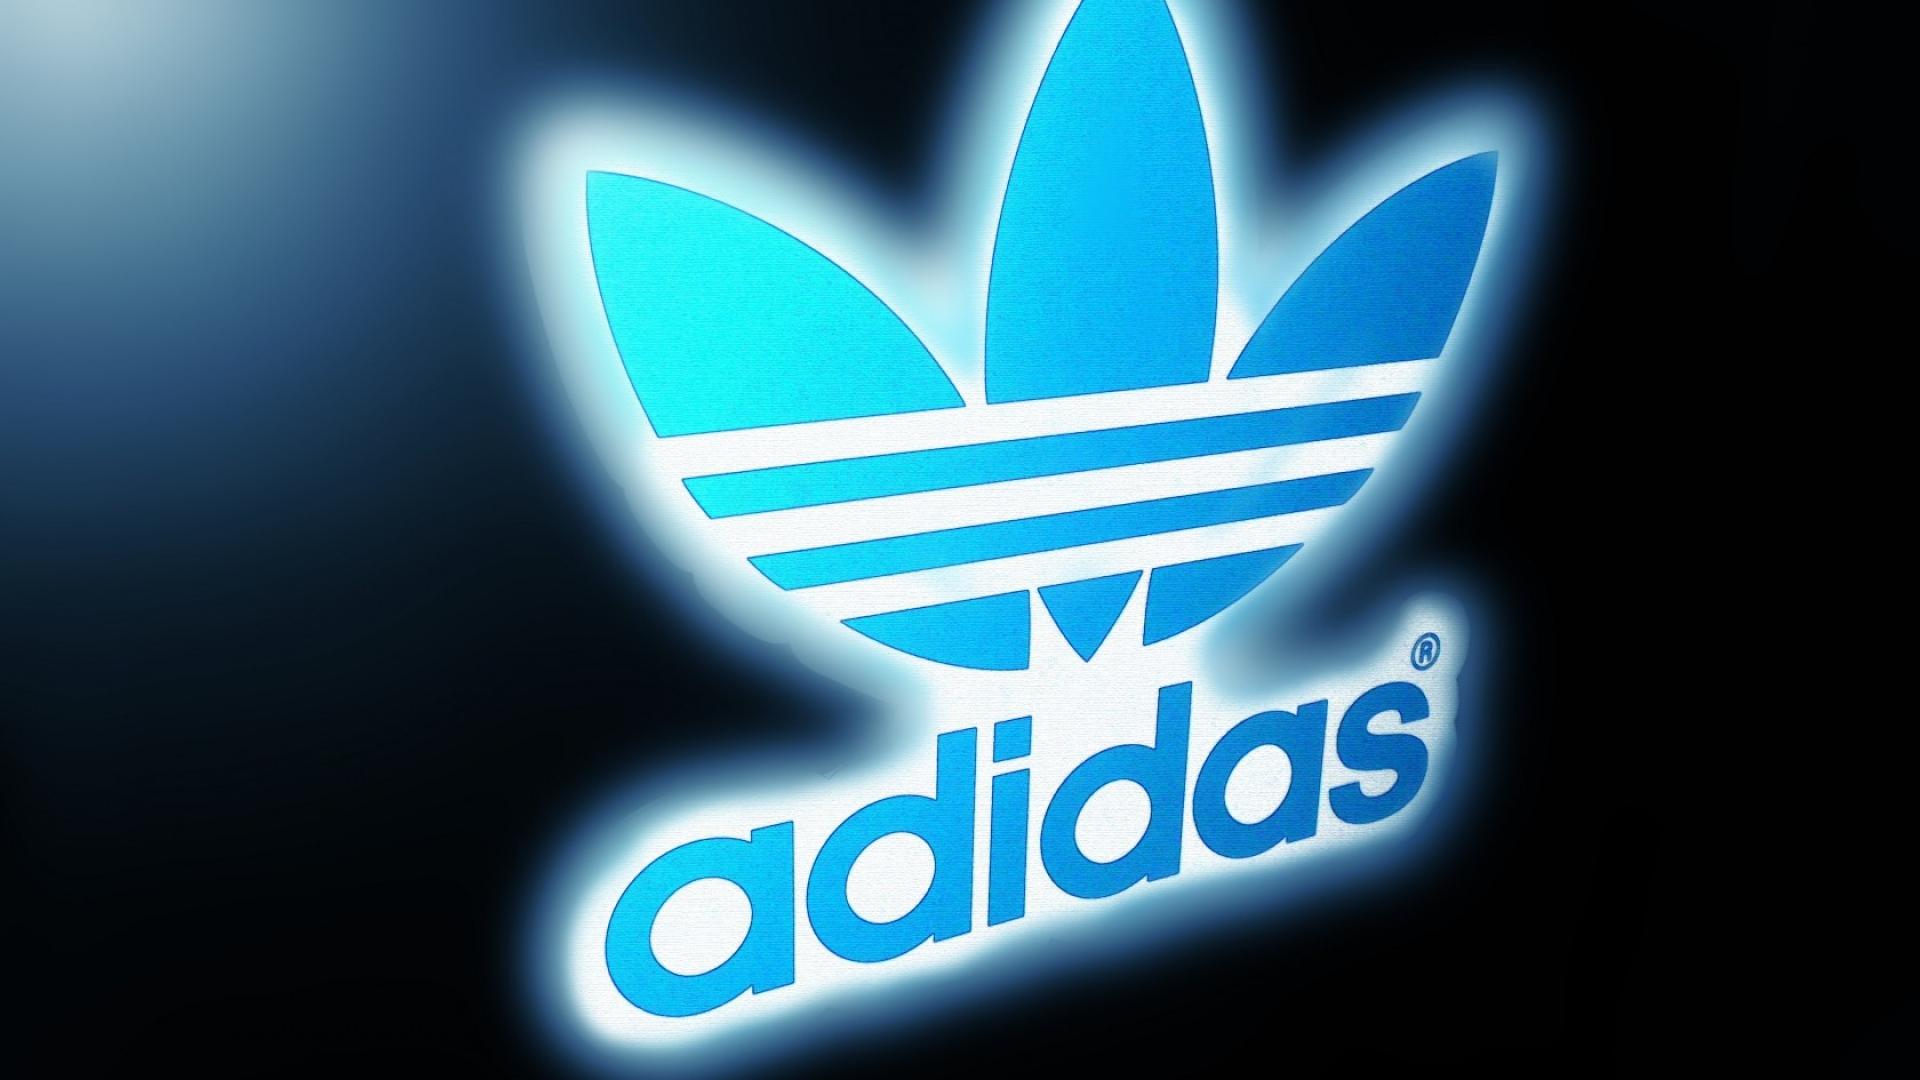 1920x1080 Adidas Style Originals Background Blue Logo Wallpaper 1920x1080